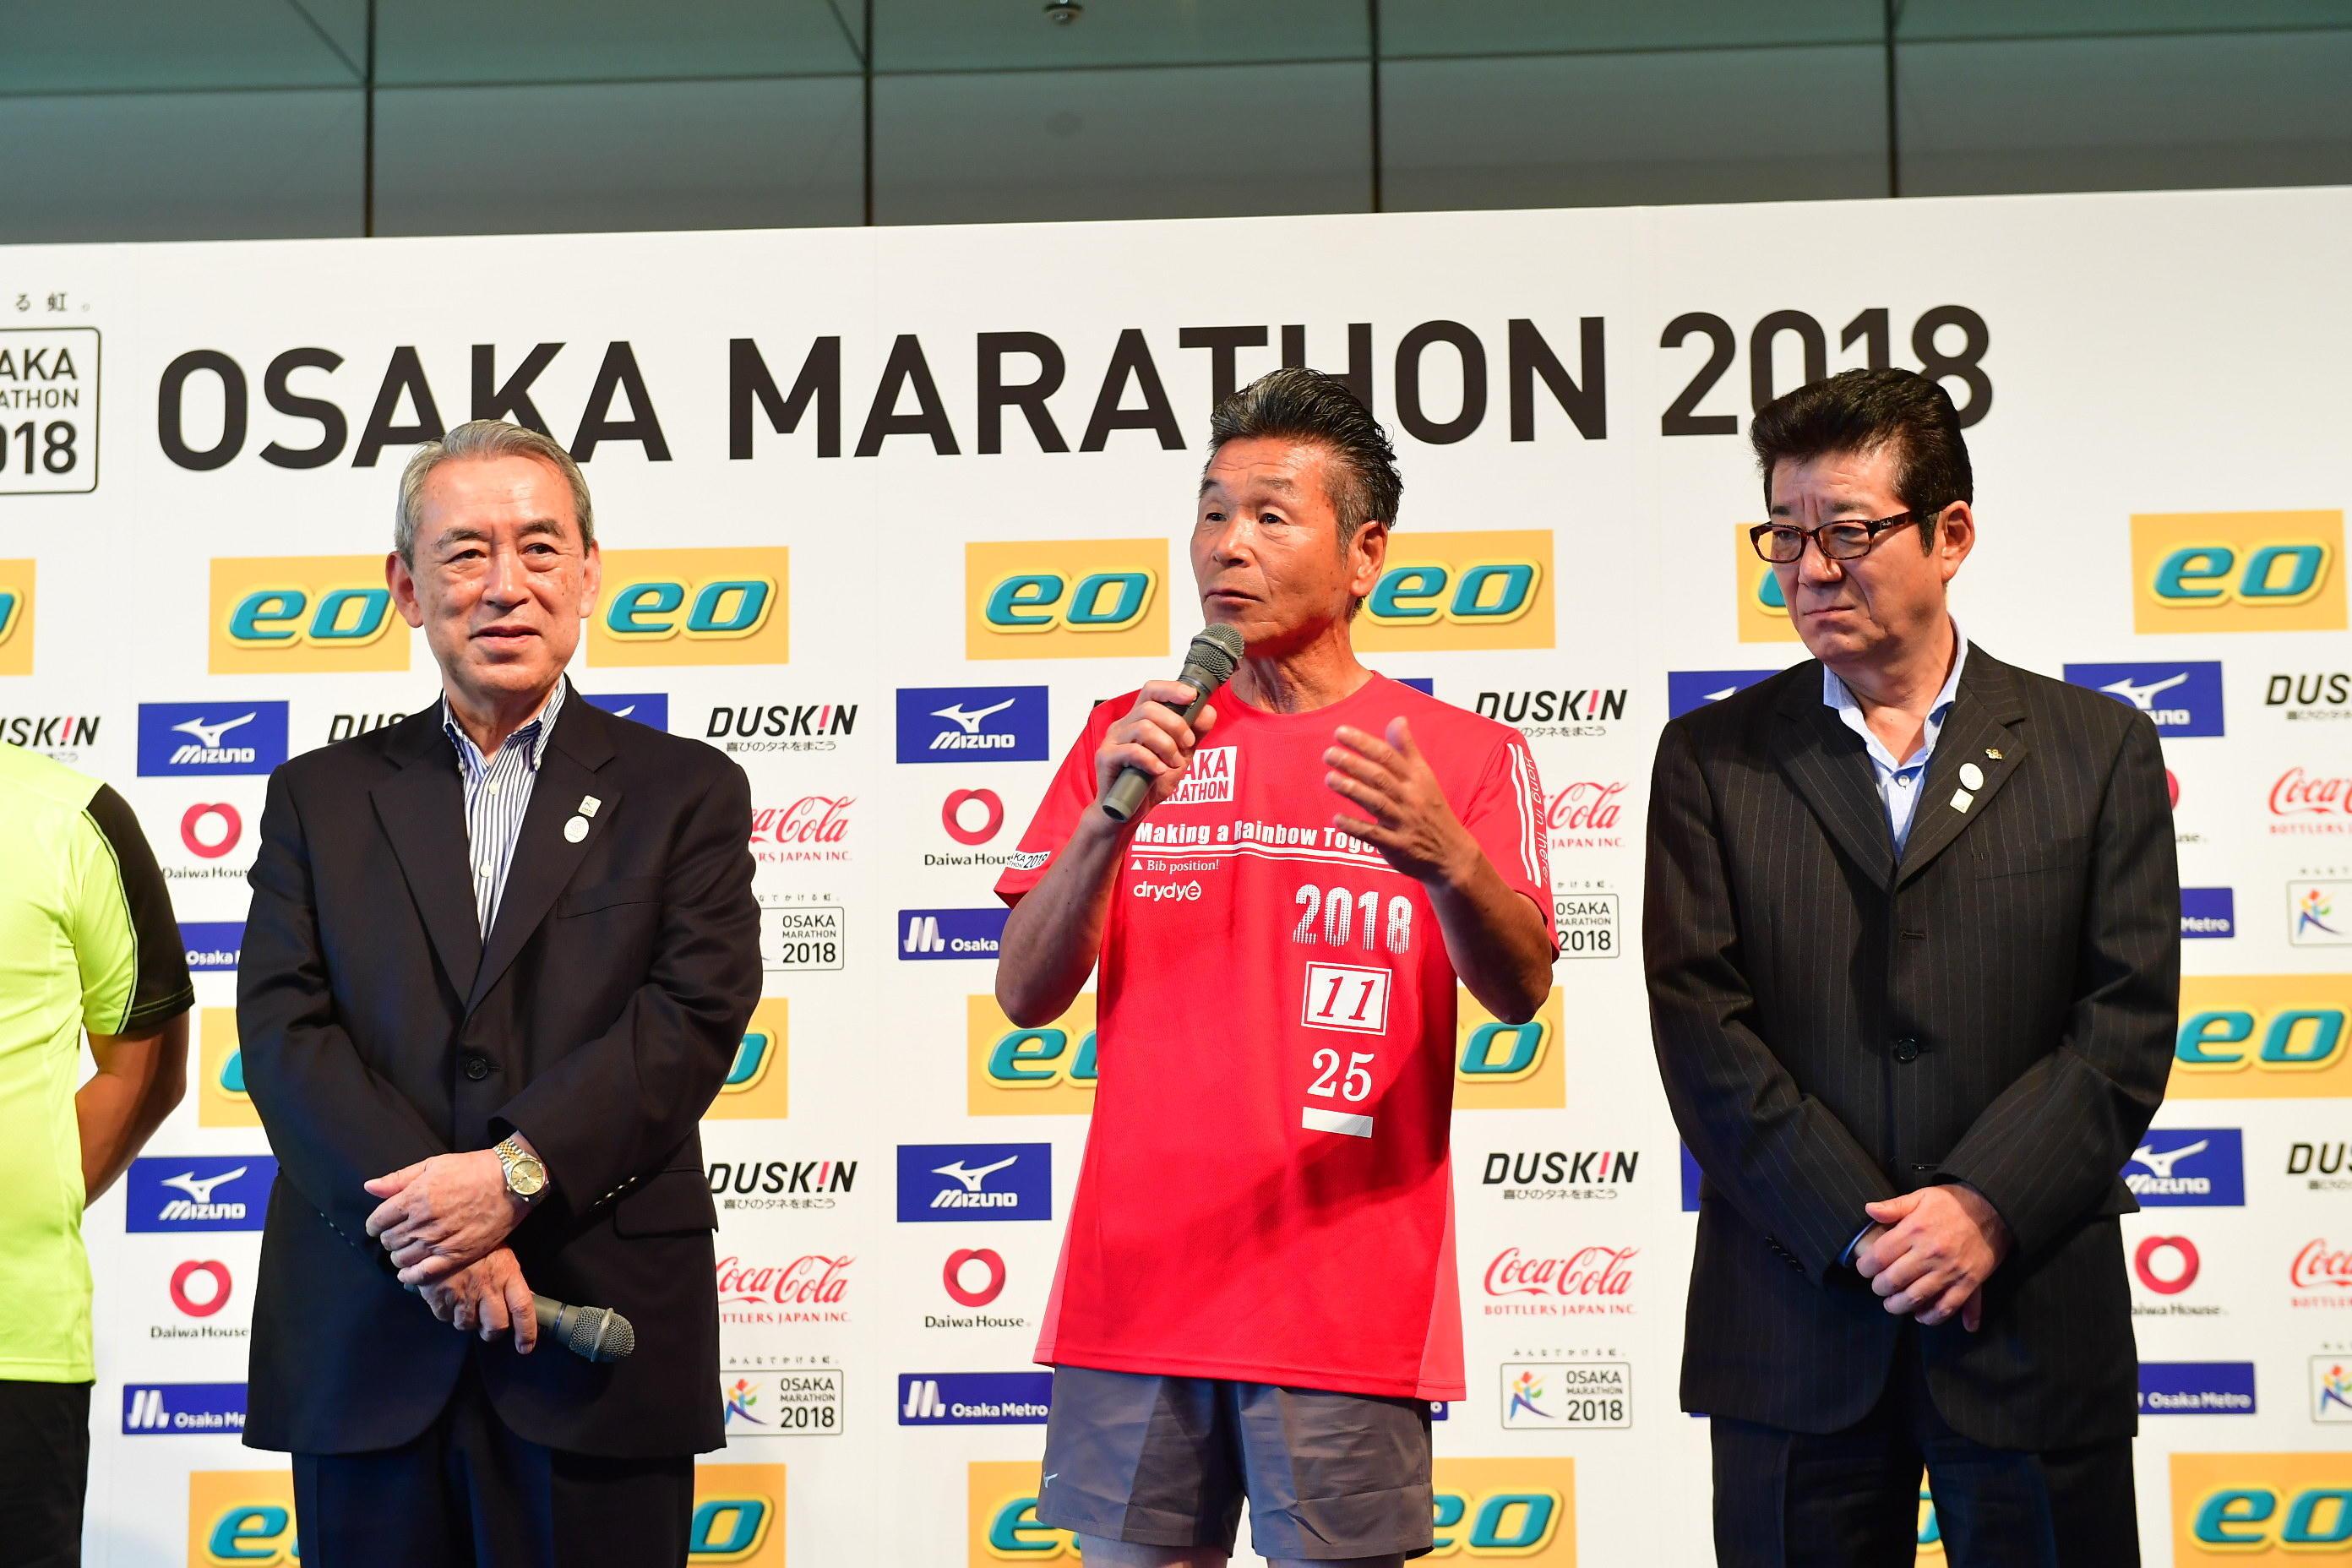 http://news.yoshimoto.co.jp/20180630190826-3856b16d6dedba3fe47ec1089d0a8f8d80a92e65.jpg